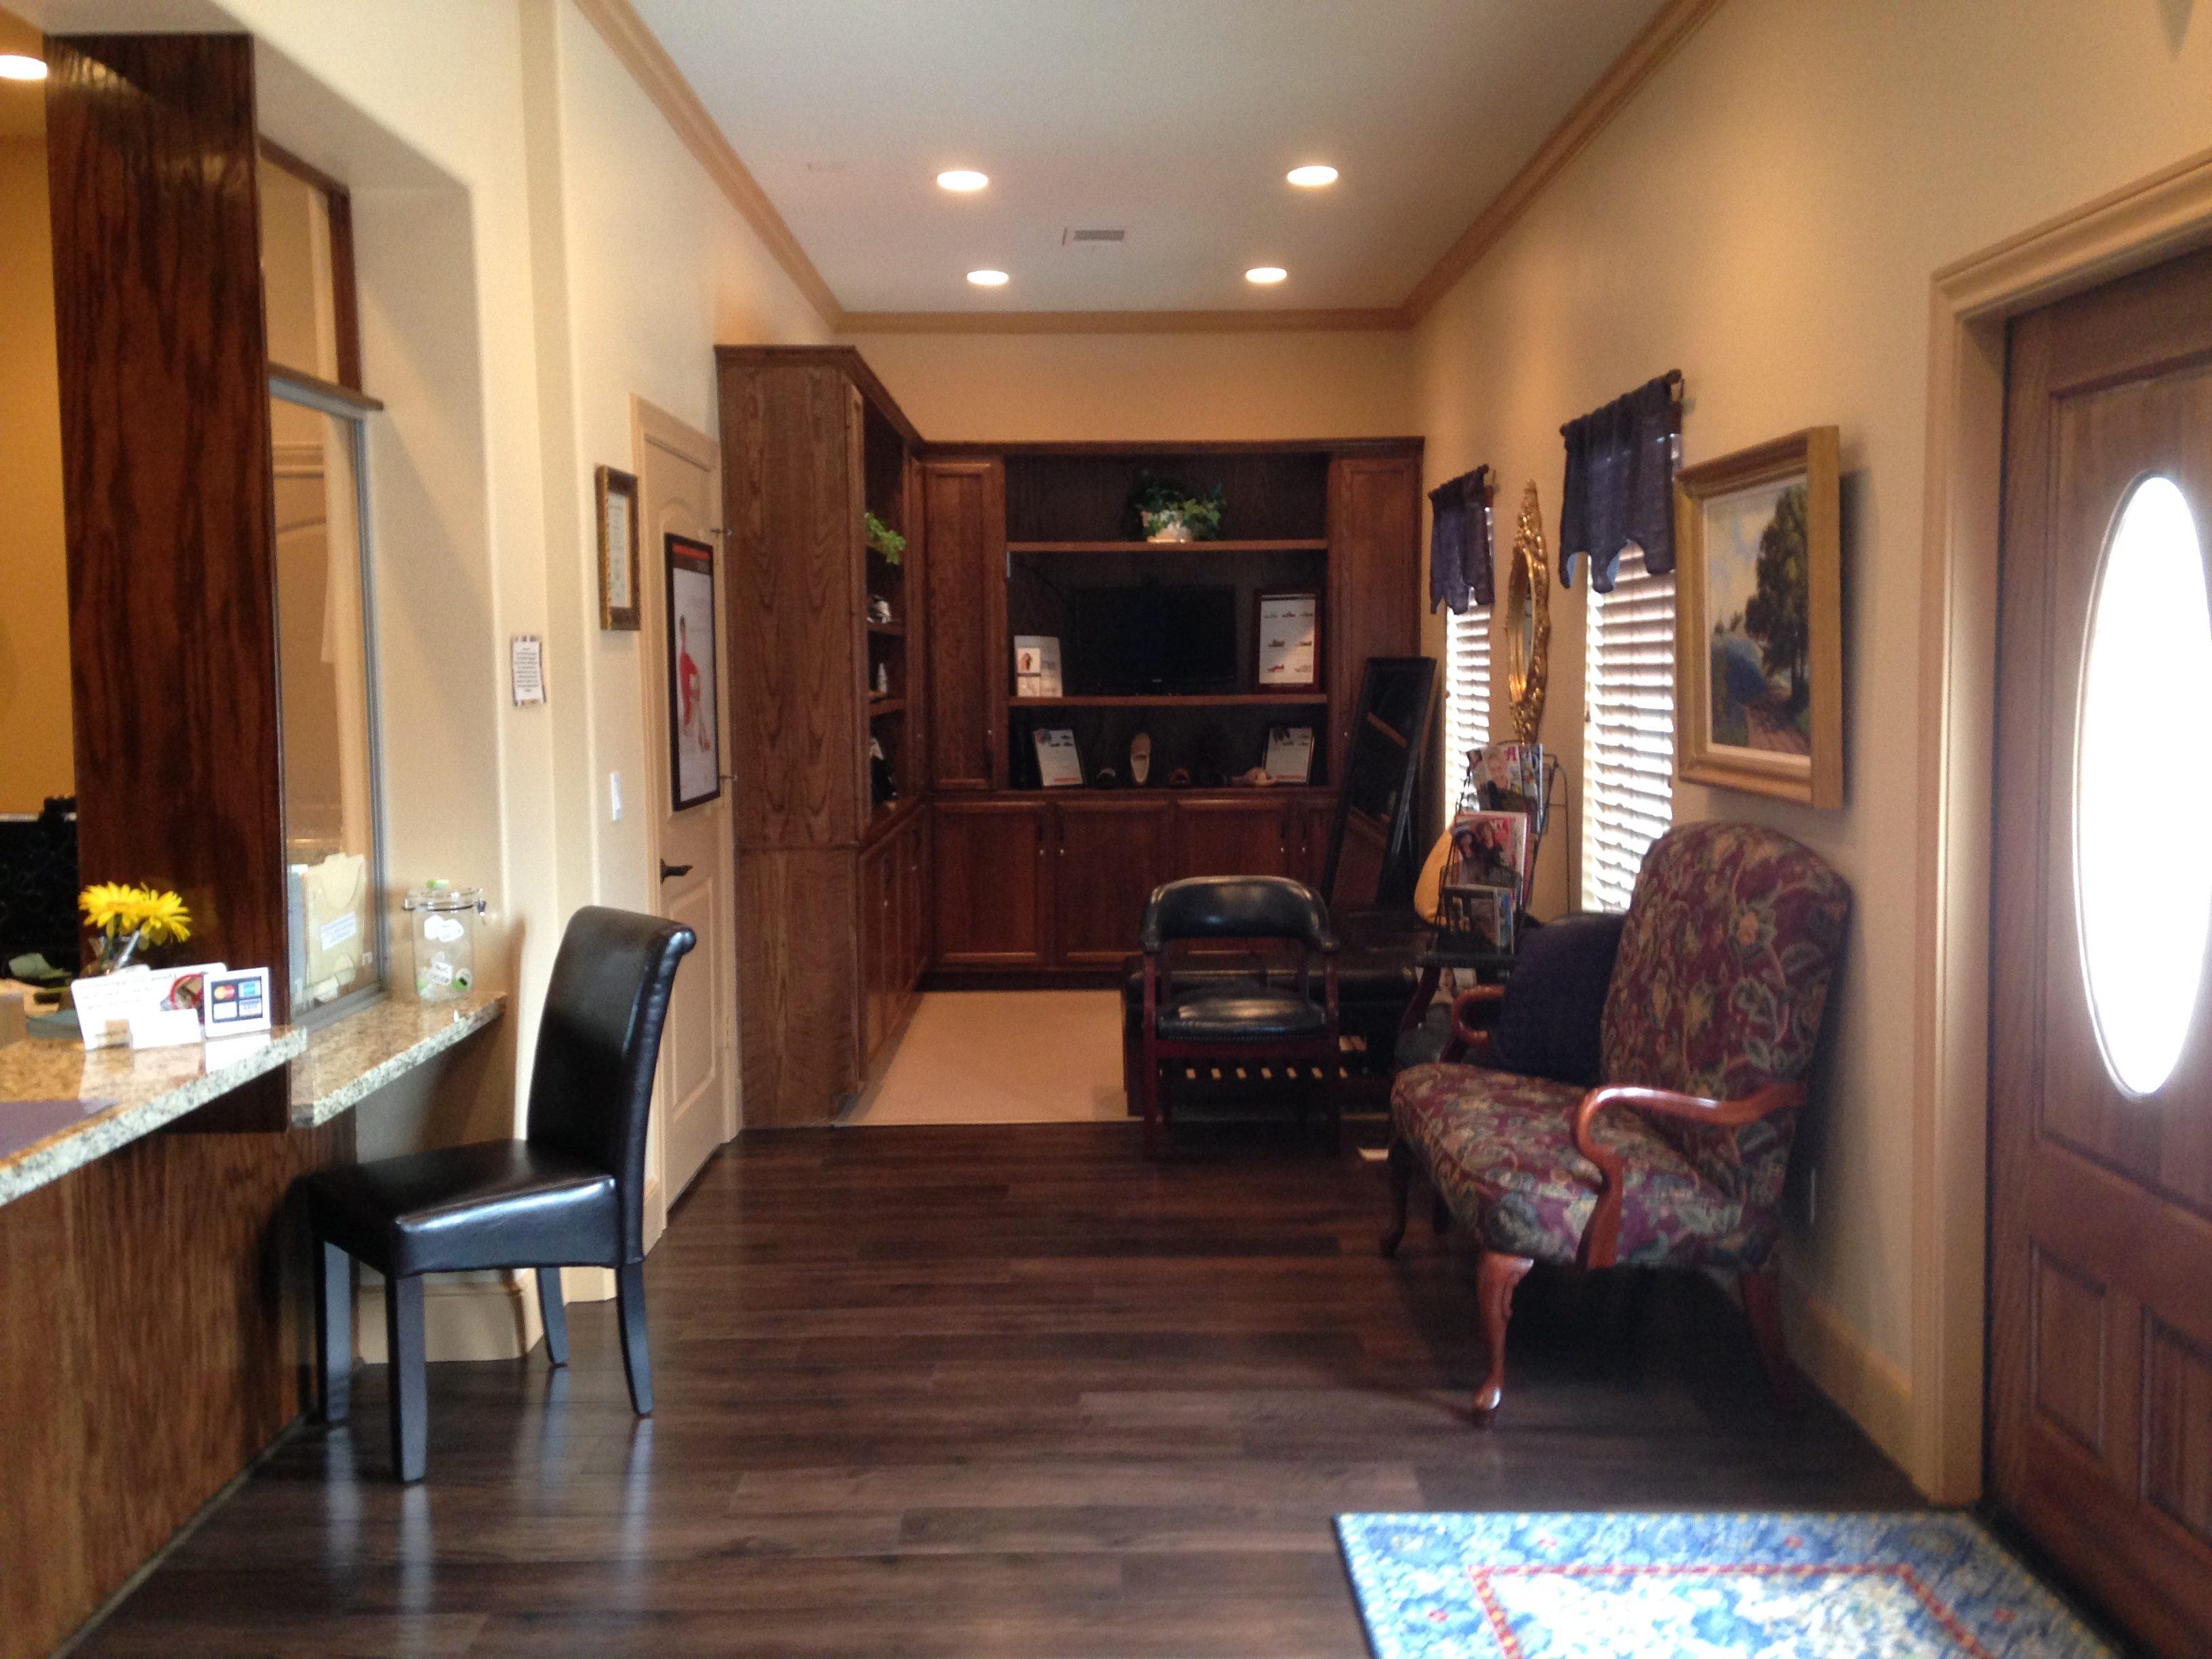 Katy foot podiatrist office interior